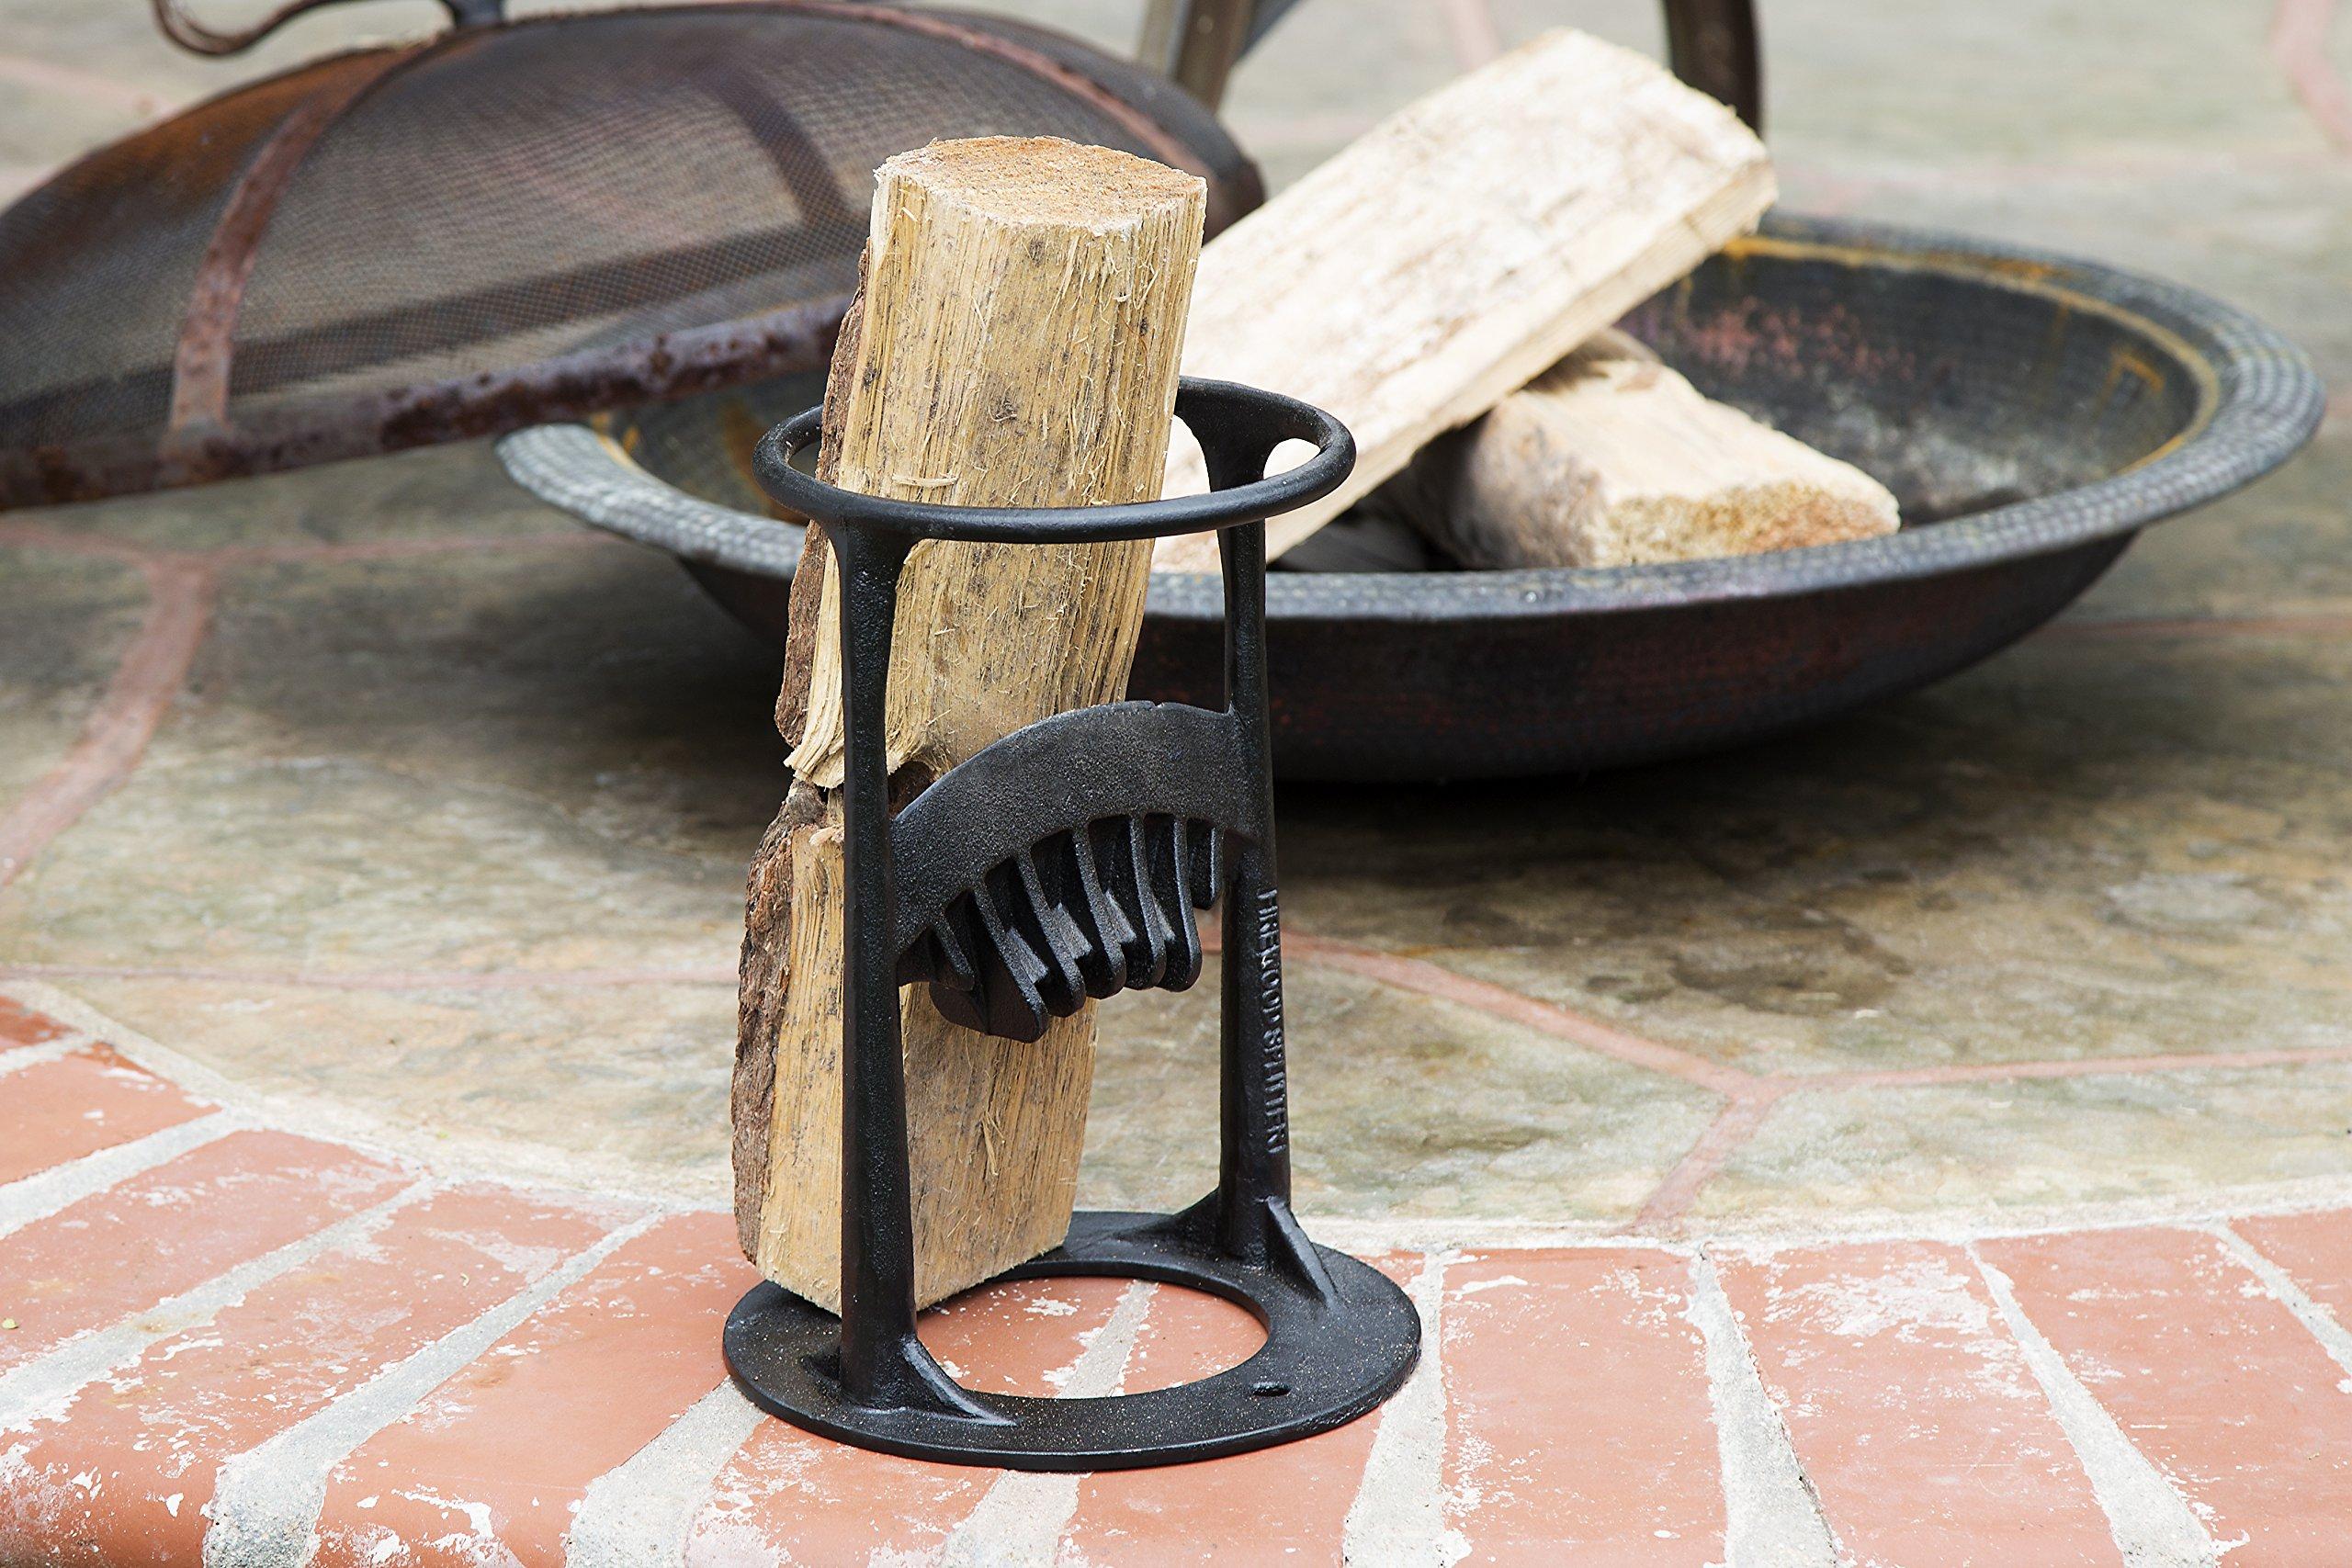 Inertia Wood Splitter - Cast Iron Manual Log Splitter - No Sharp Edges - No More Axes! by Inertia Gear (Image #5)